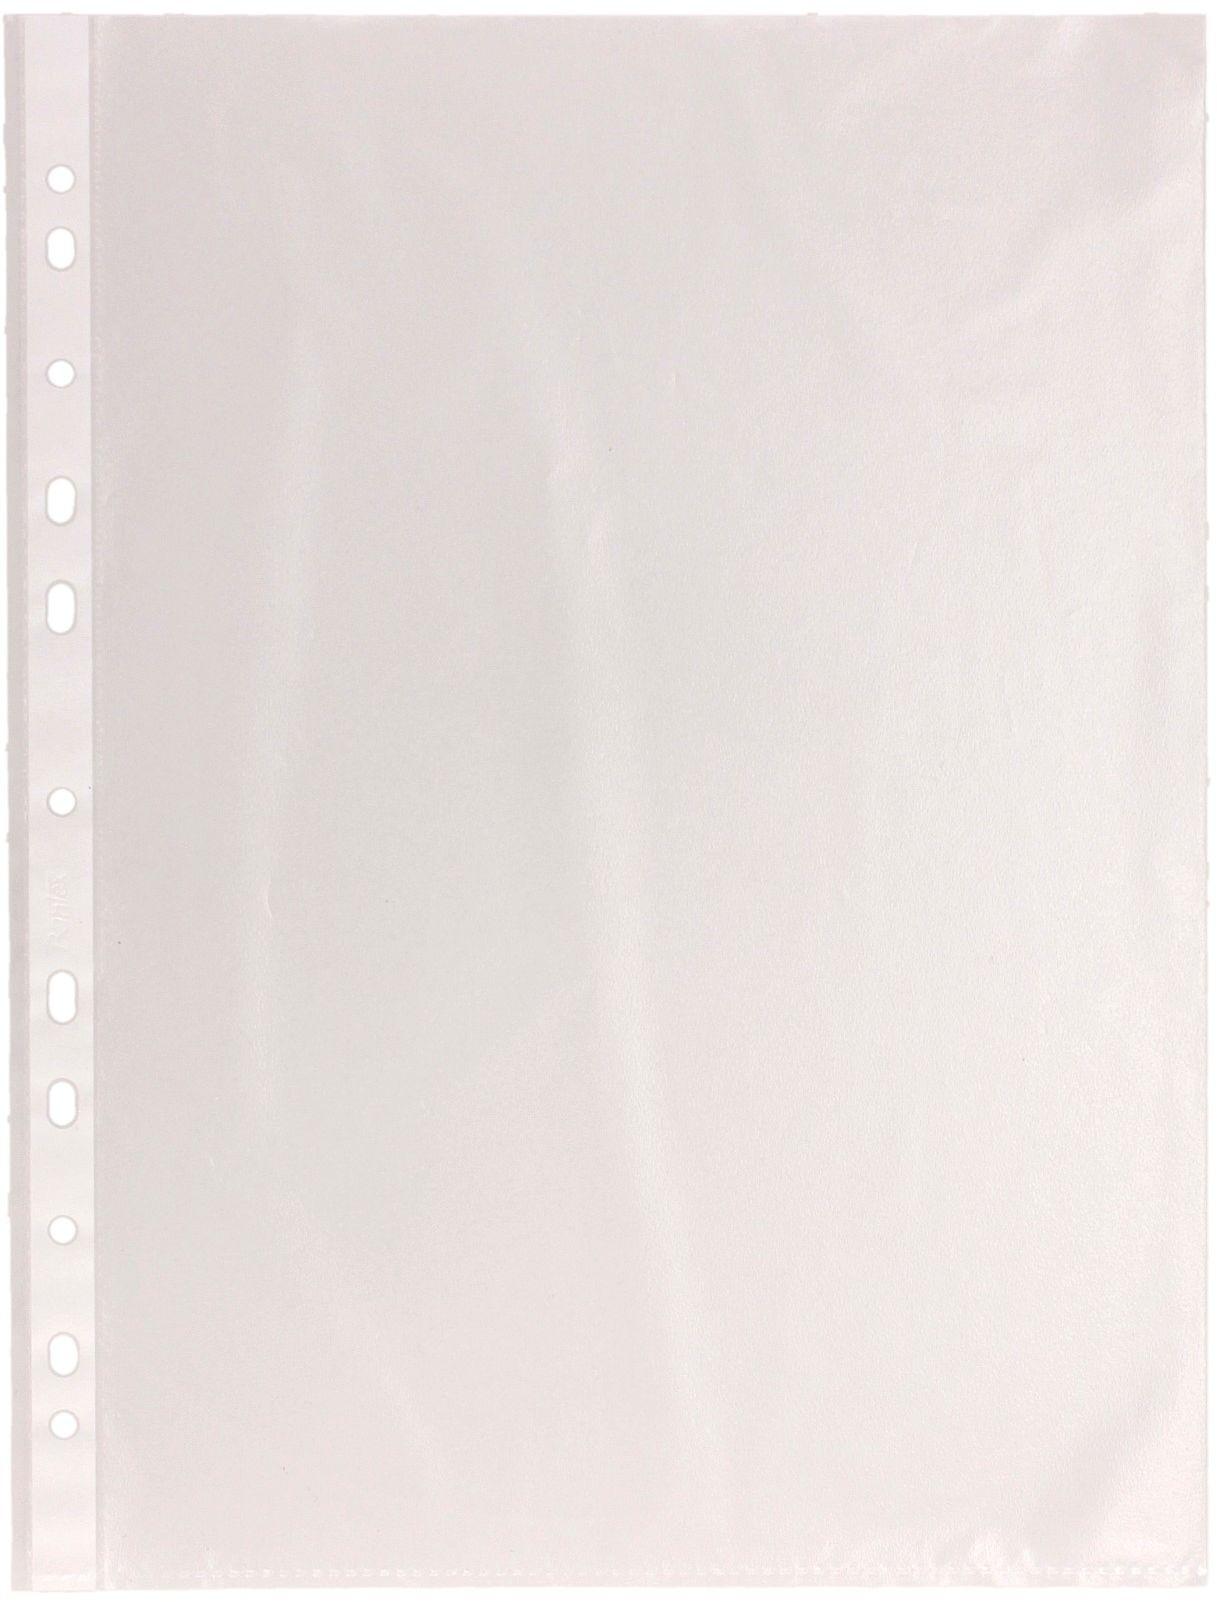 Koszulki groszkowe A4 (100)/folia 40mic Herlitz